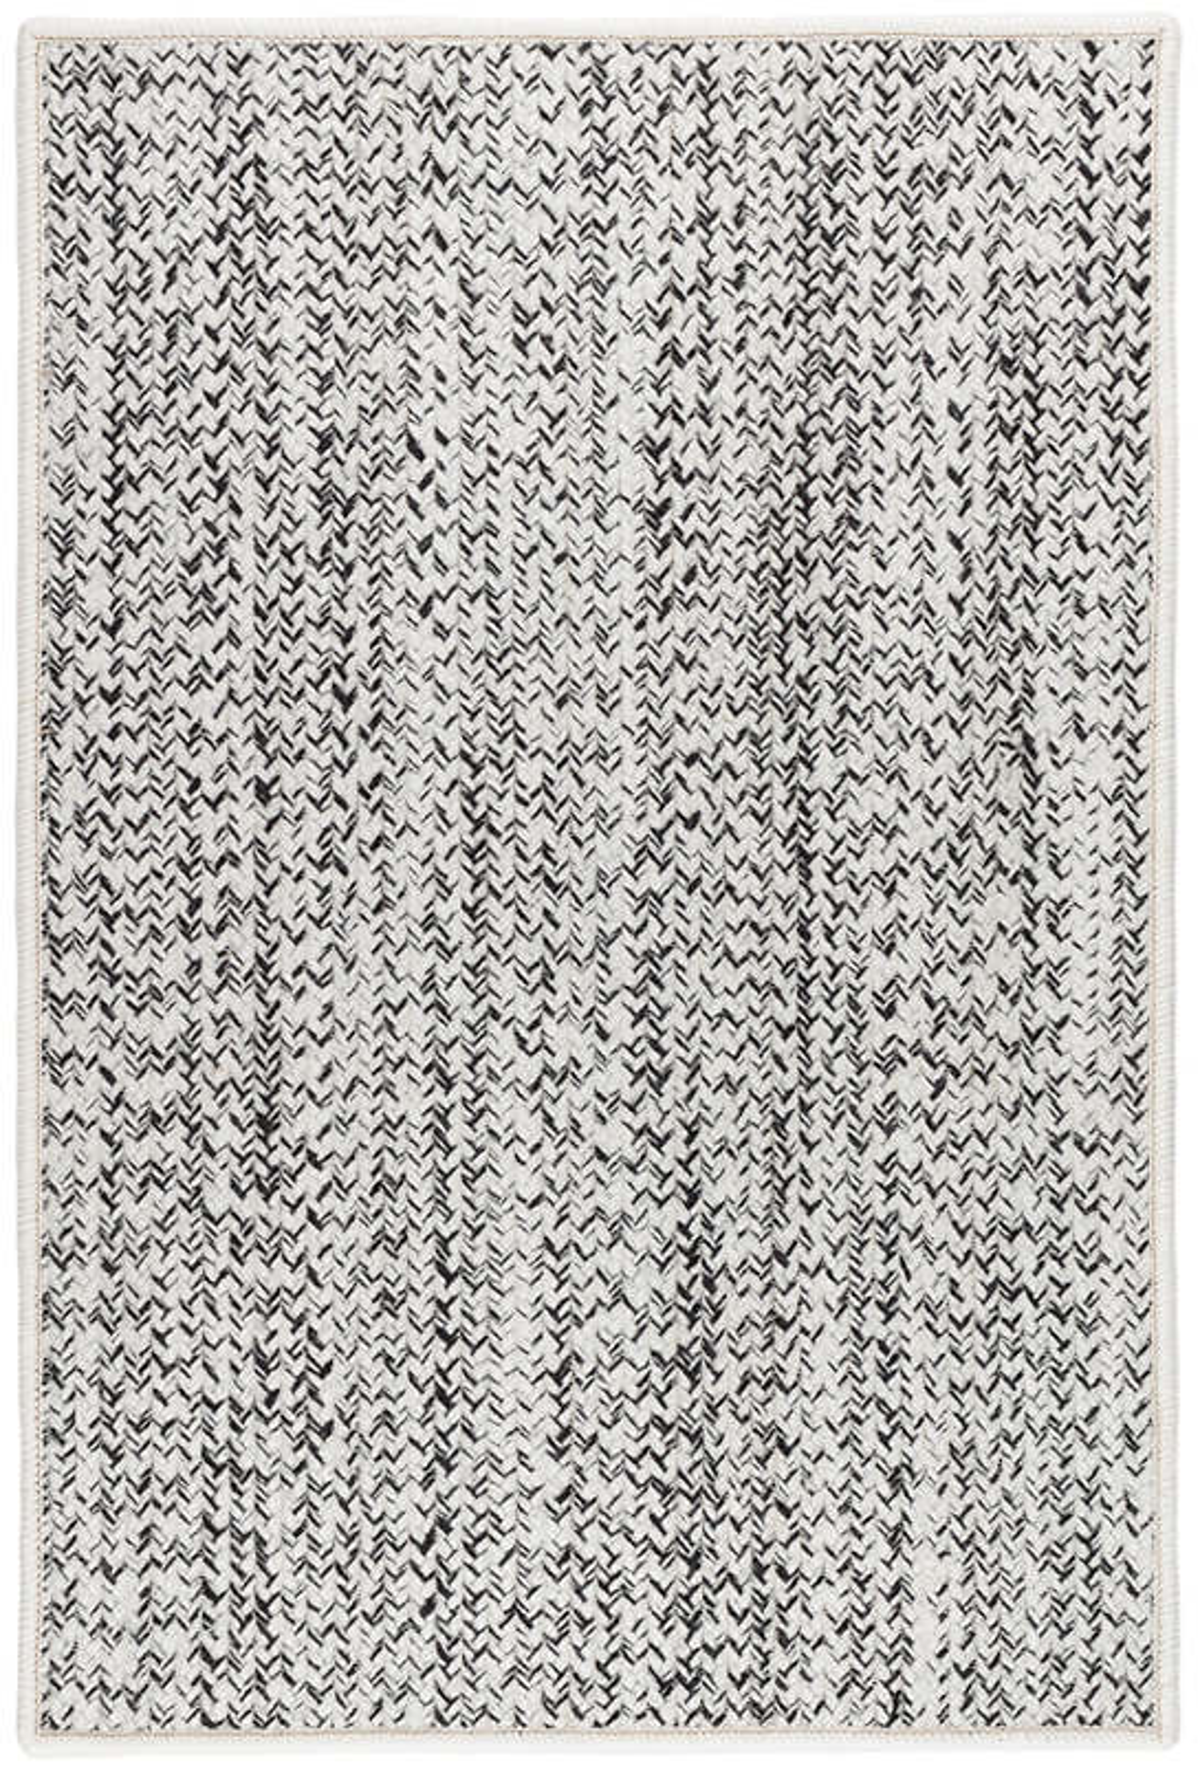 Lucy Black Woven Custom Rug